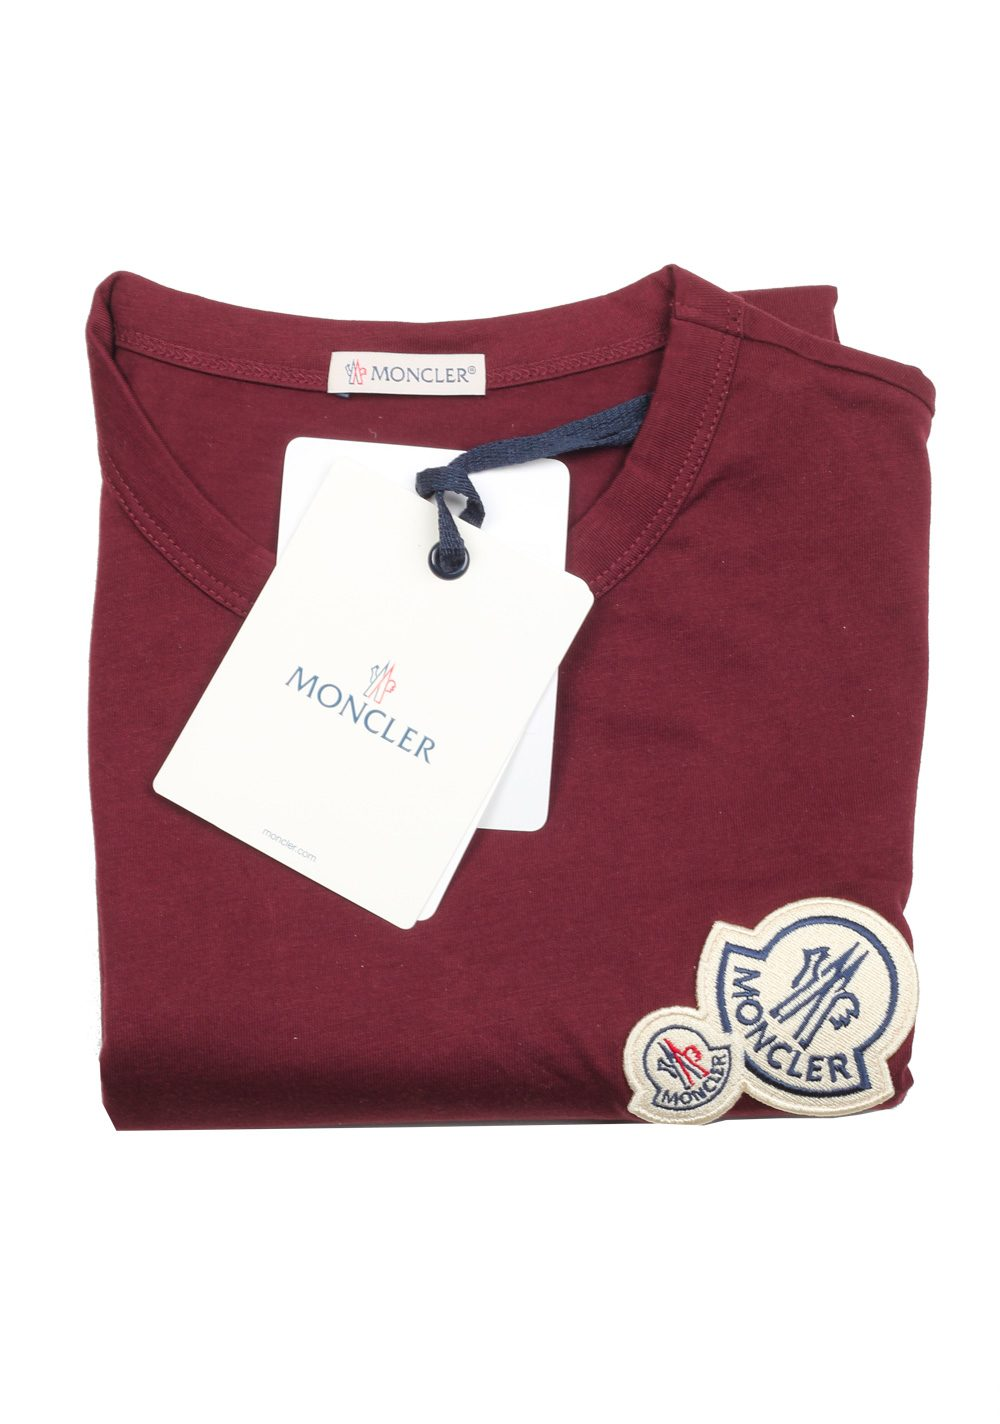 Moncler Red Brand Patch Crew Neck Tee Shirt Size L / 40R U.S. | Costume Limité